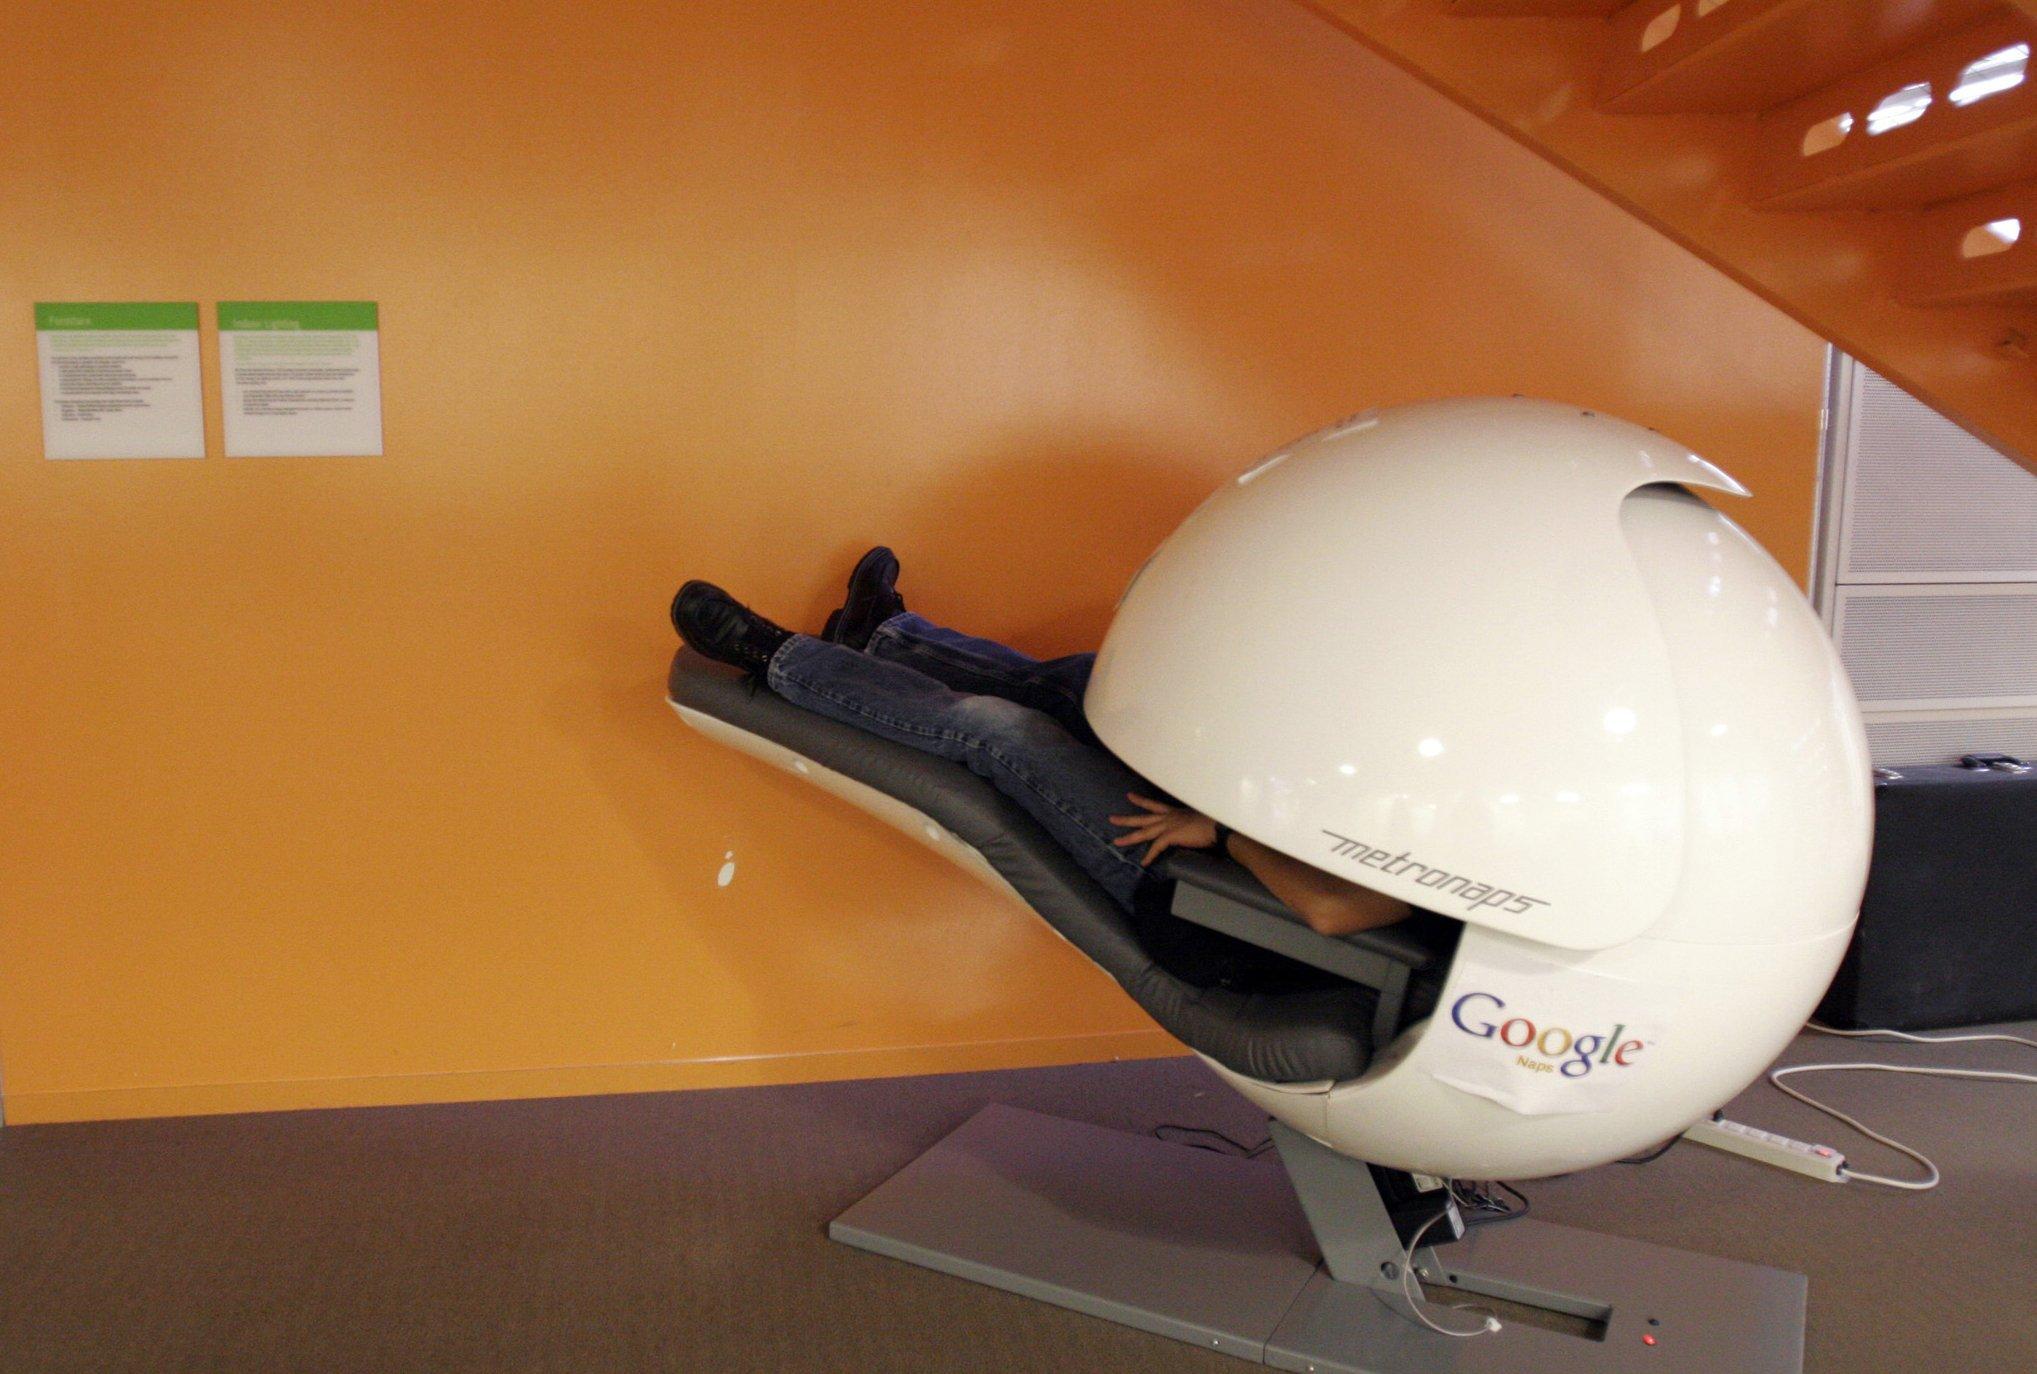 Google sleep pod